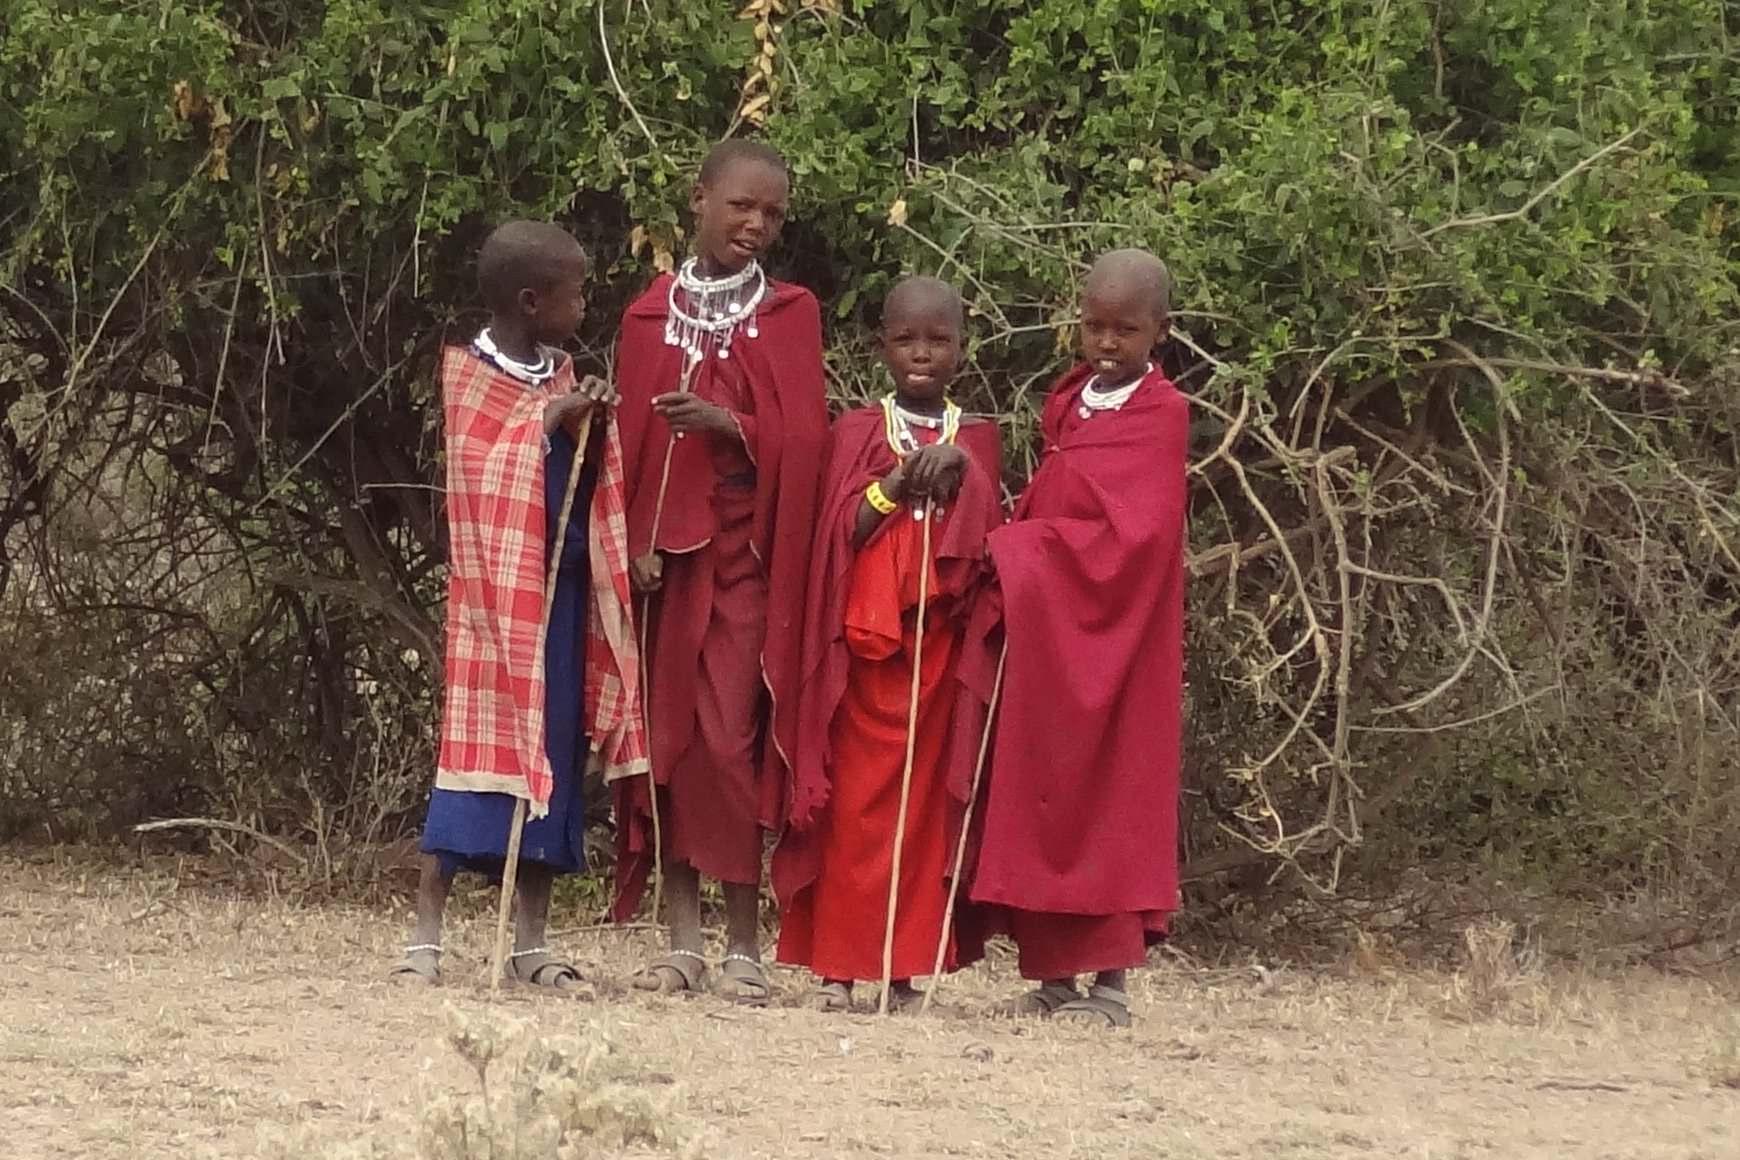 Young herders in Tanzania